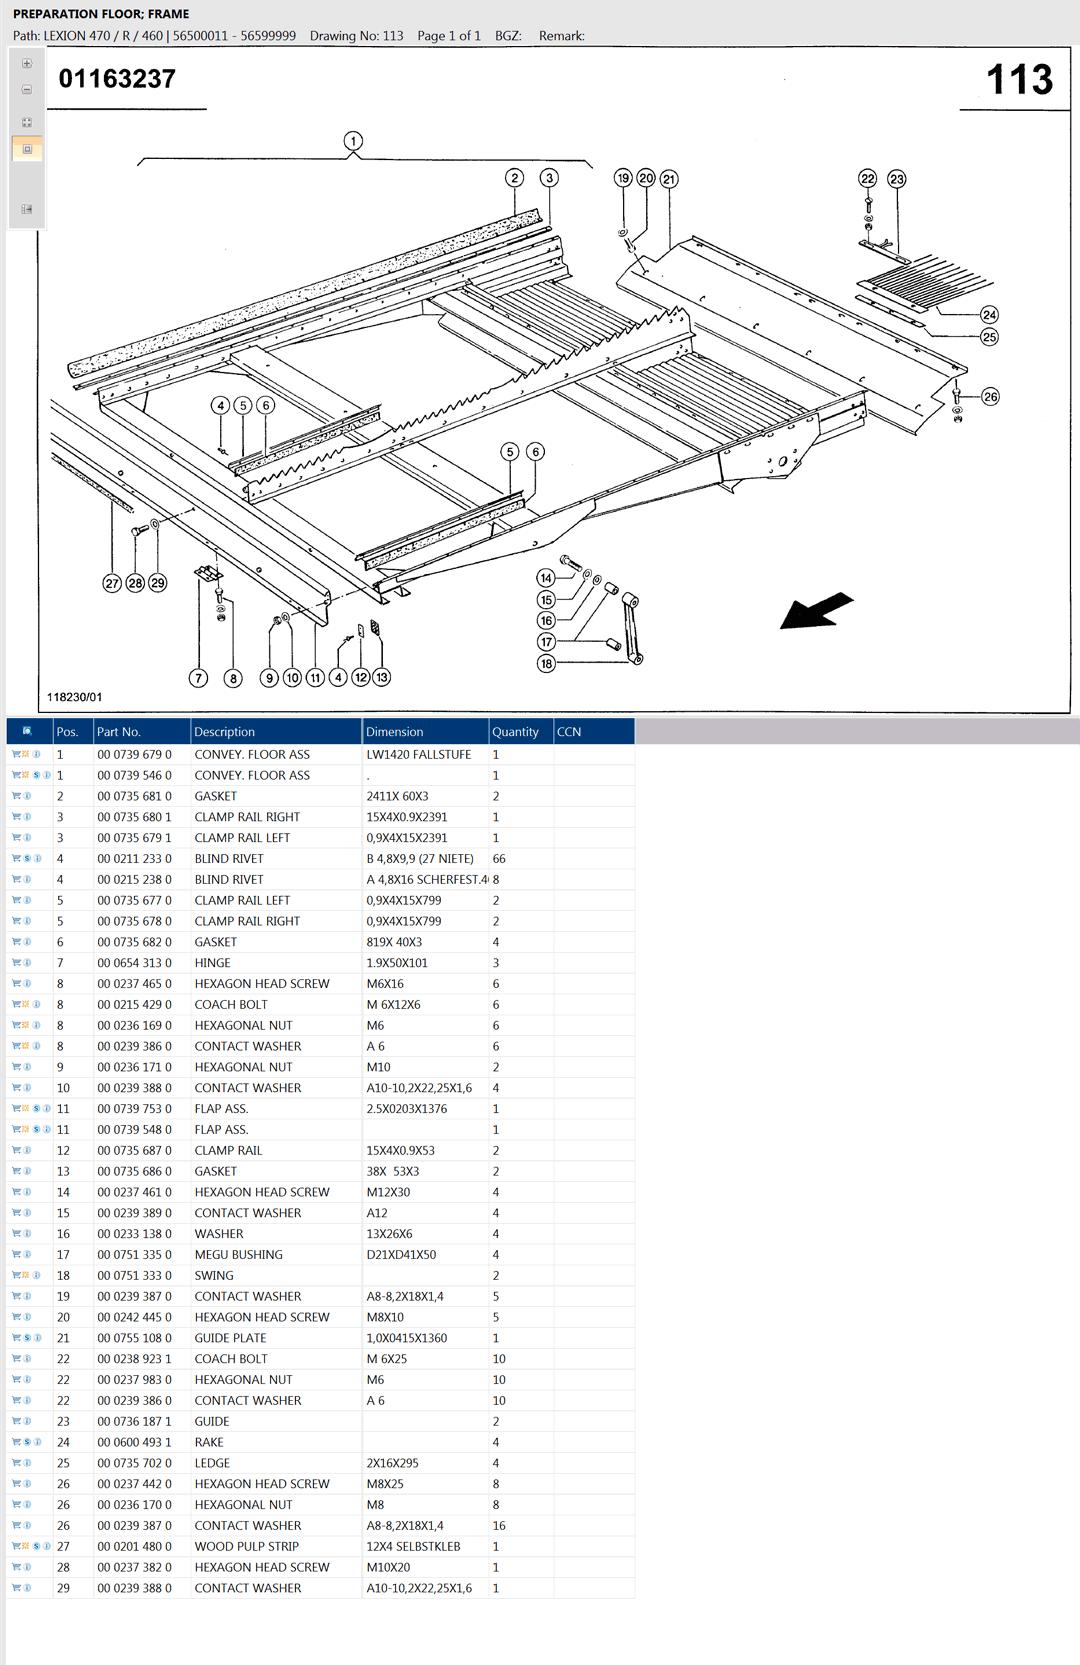 Lexion 470R parts and scheme - preparation floor